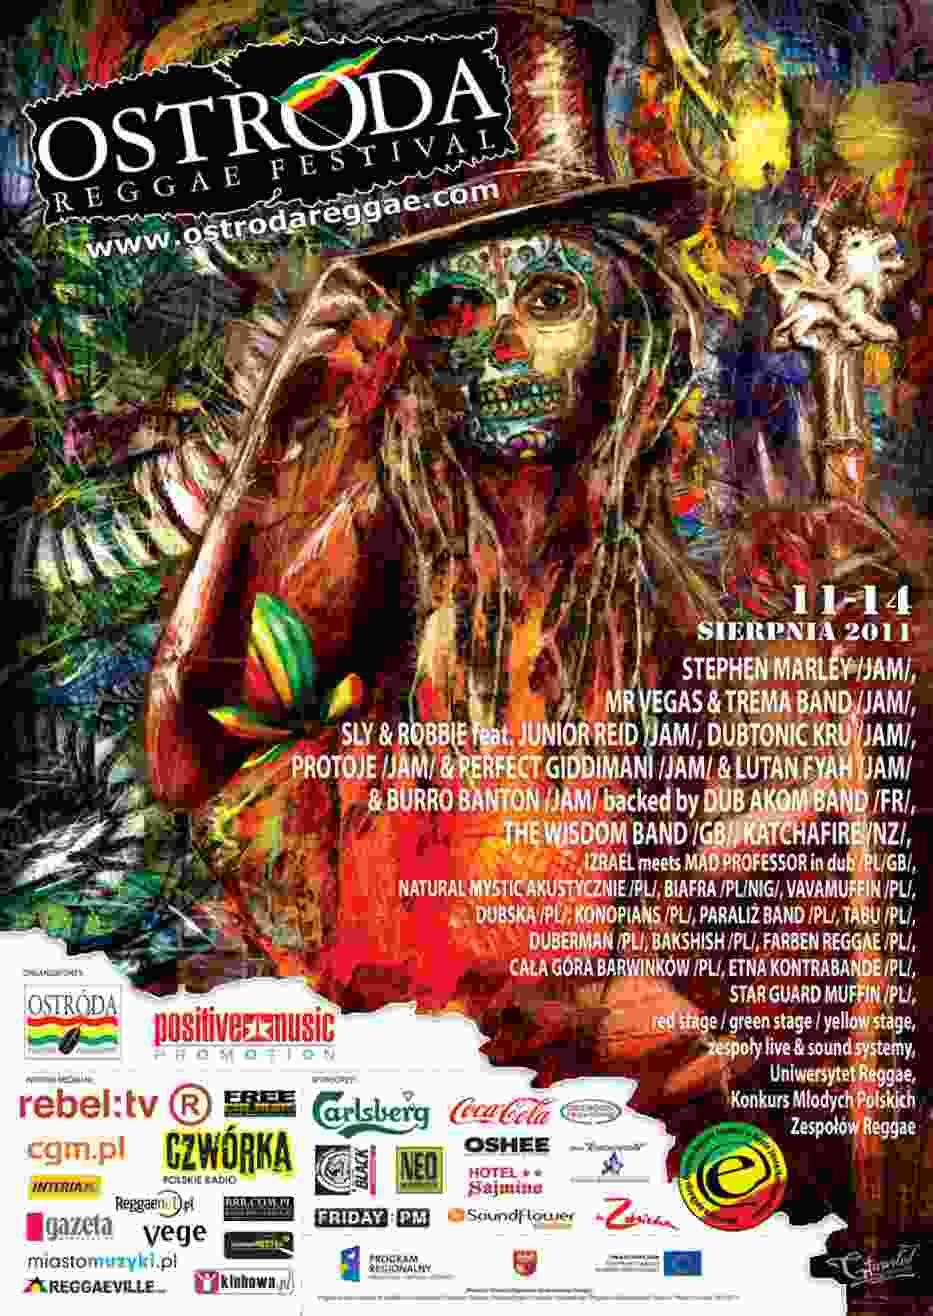 Plakat promujący Ostróda Reggae Festival 2011